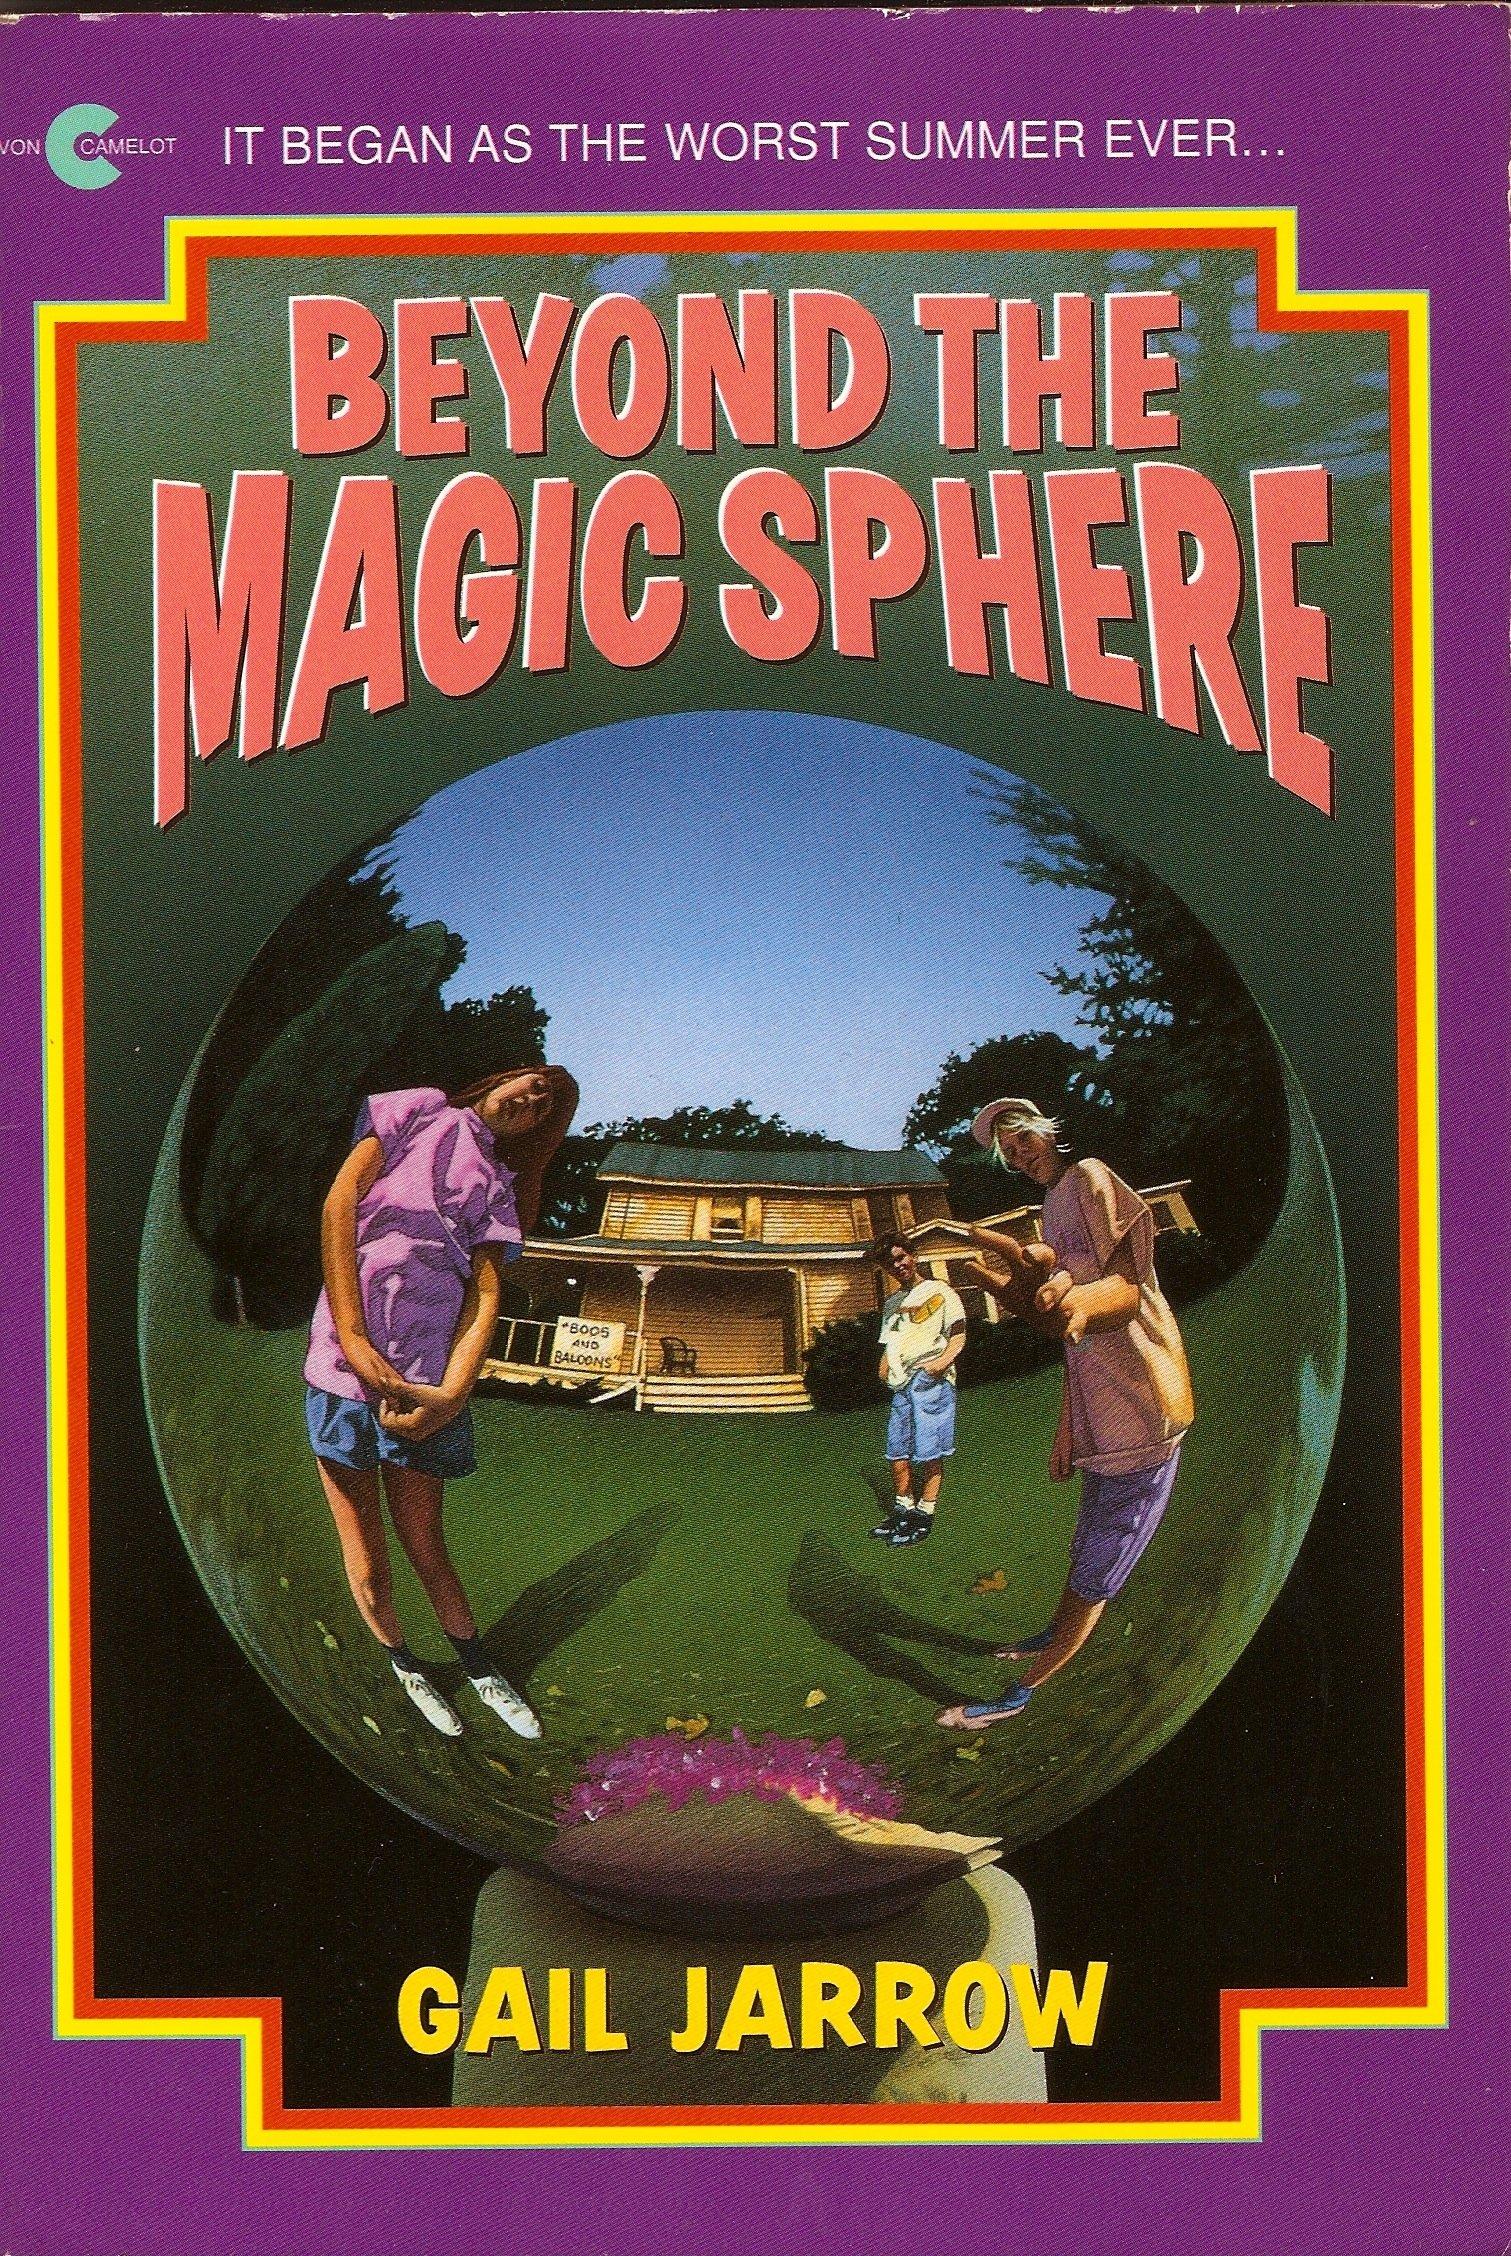 Beyond the Magic Sphere (An Avon Camelot Book)